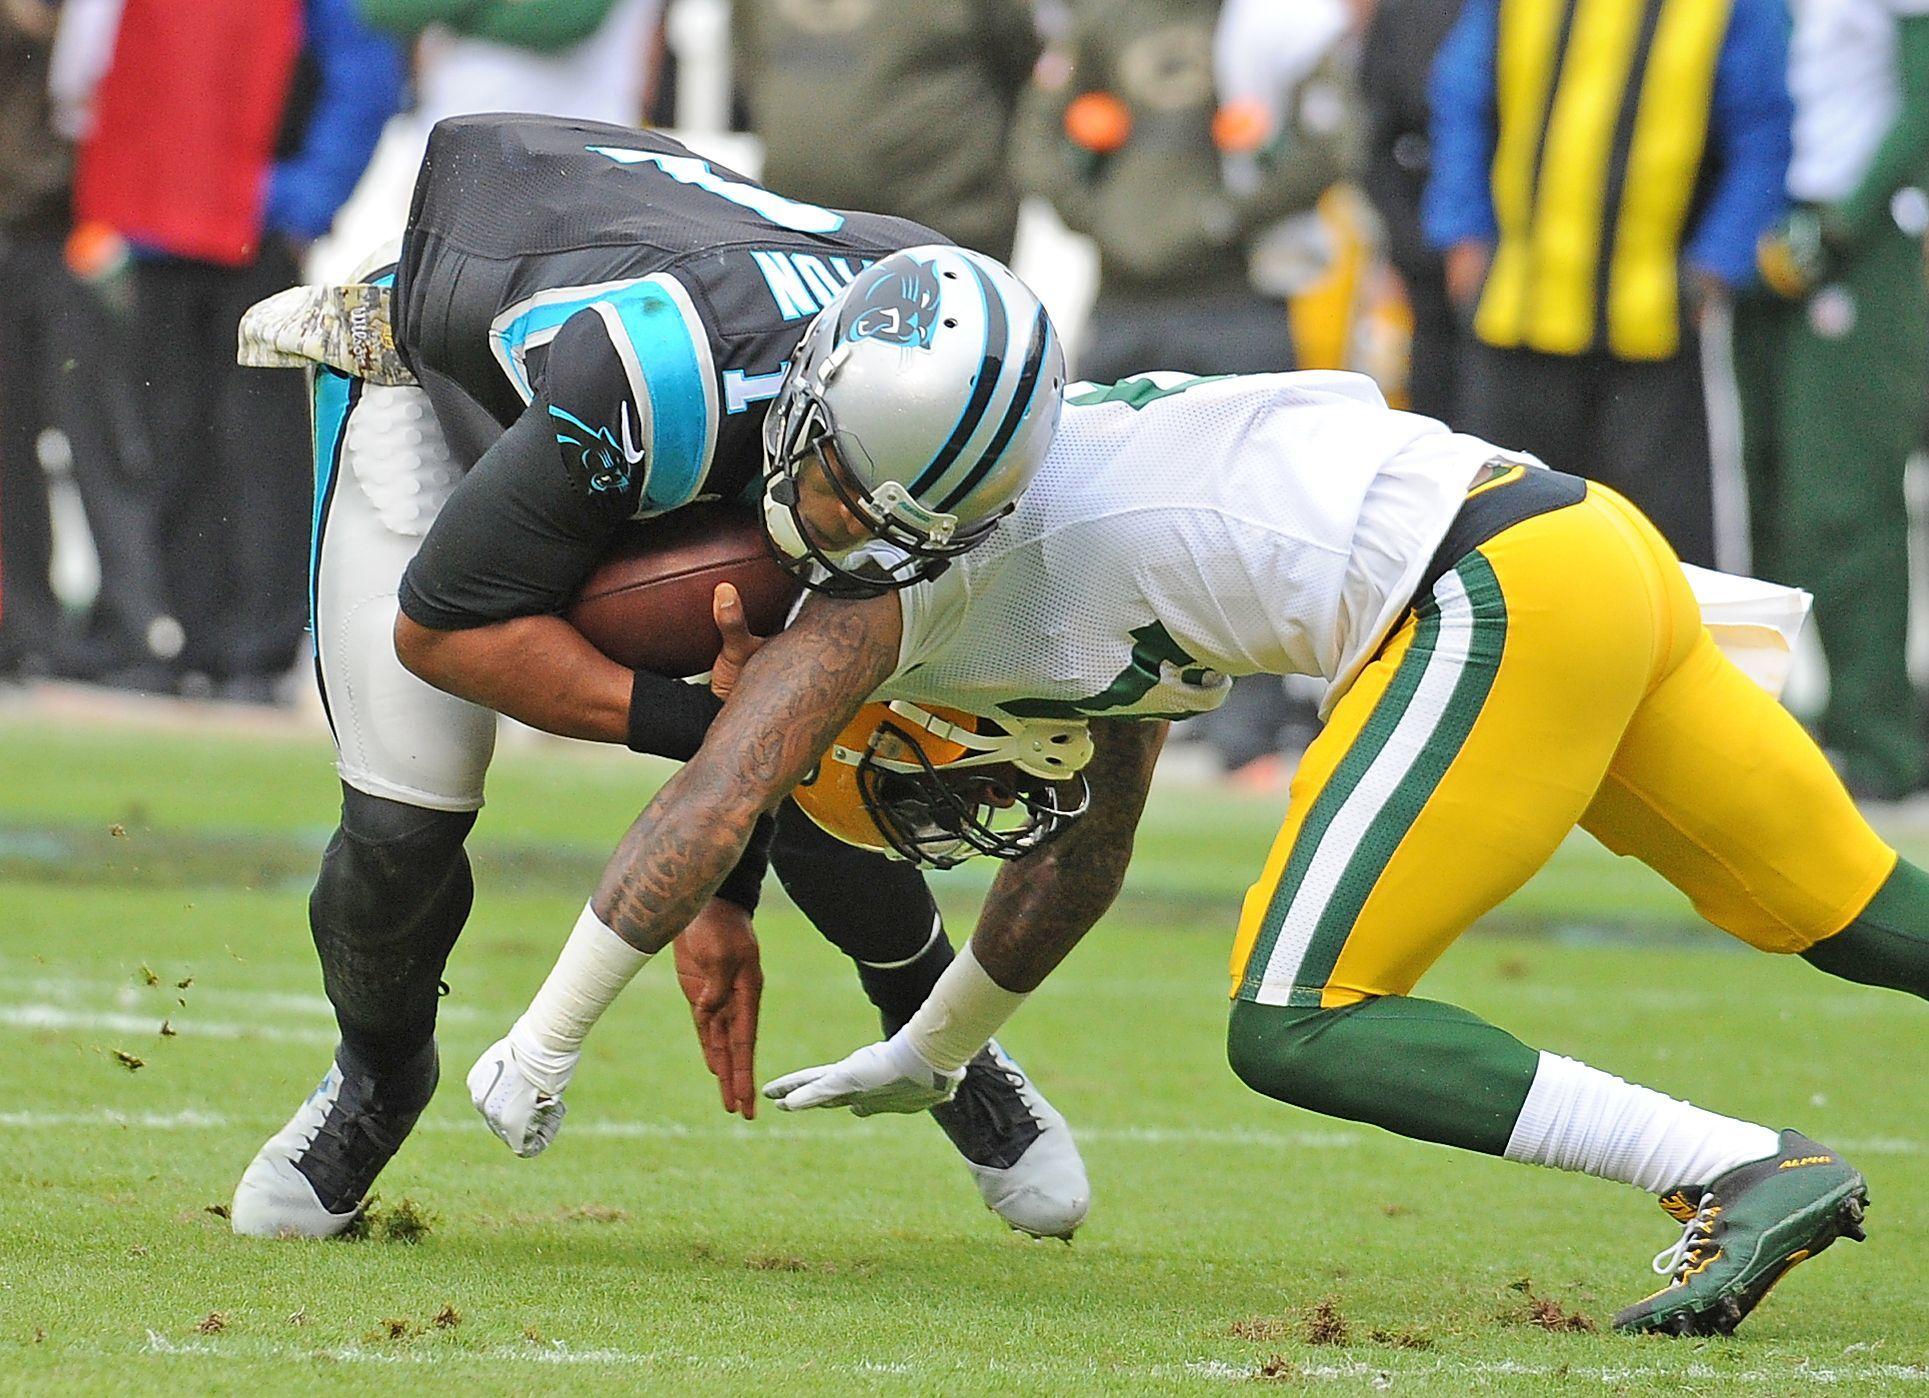 Green Bay Packers free safety Ha Ha Clinton-Dix (21) tackles Carolina Panthers quarterback Cam Newton (1) at Bank of America Stadium on Nov. 8, 2015.